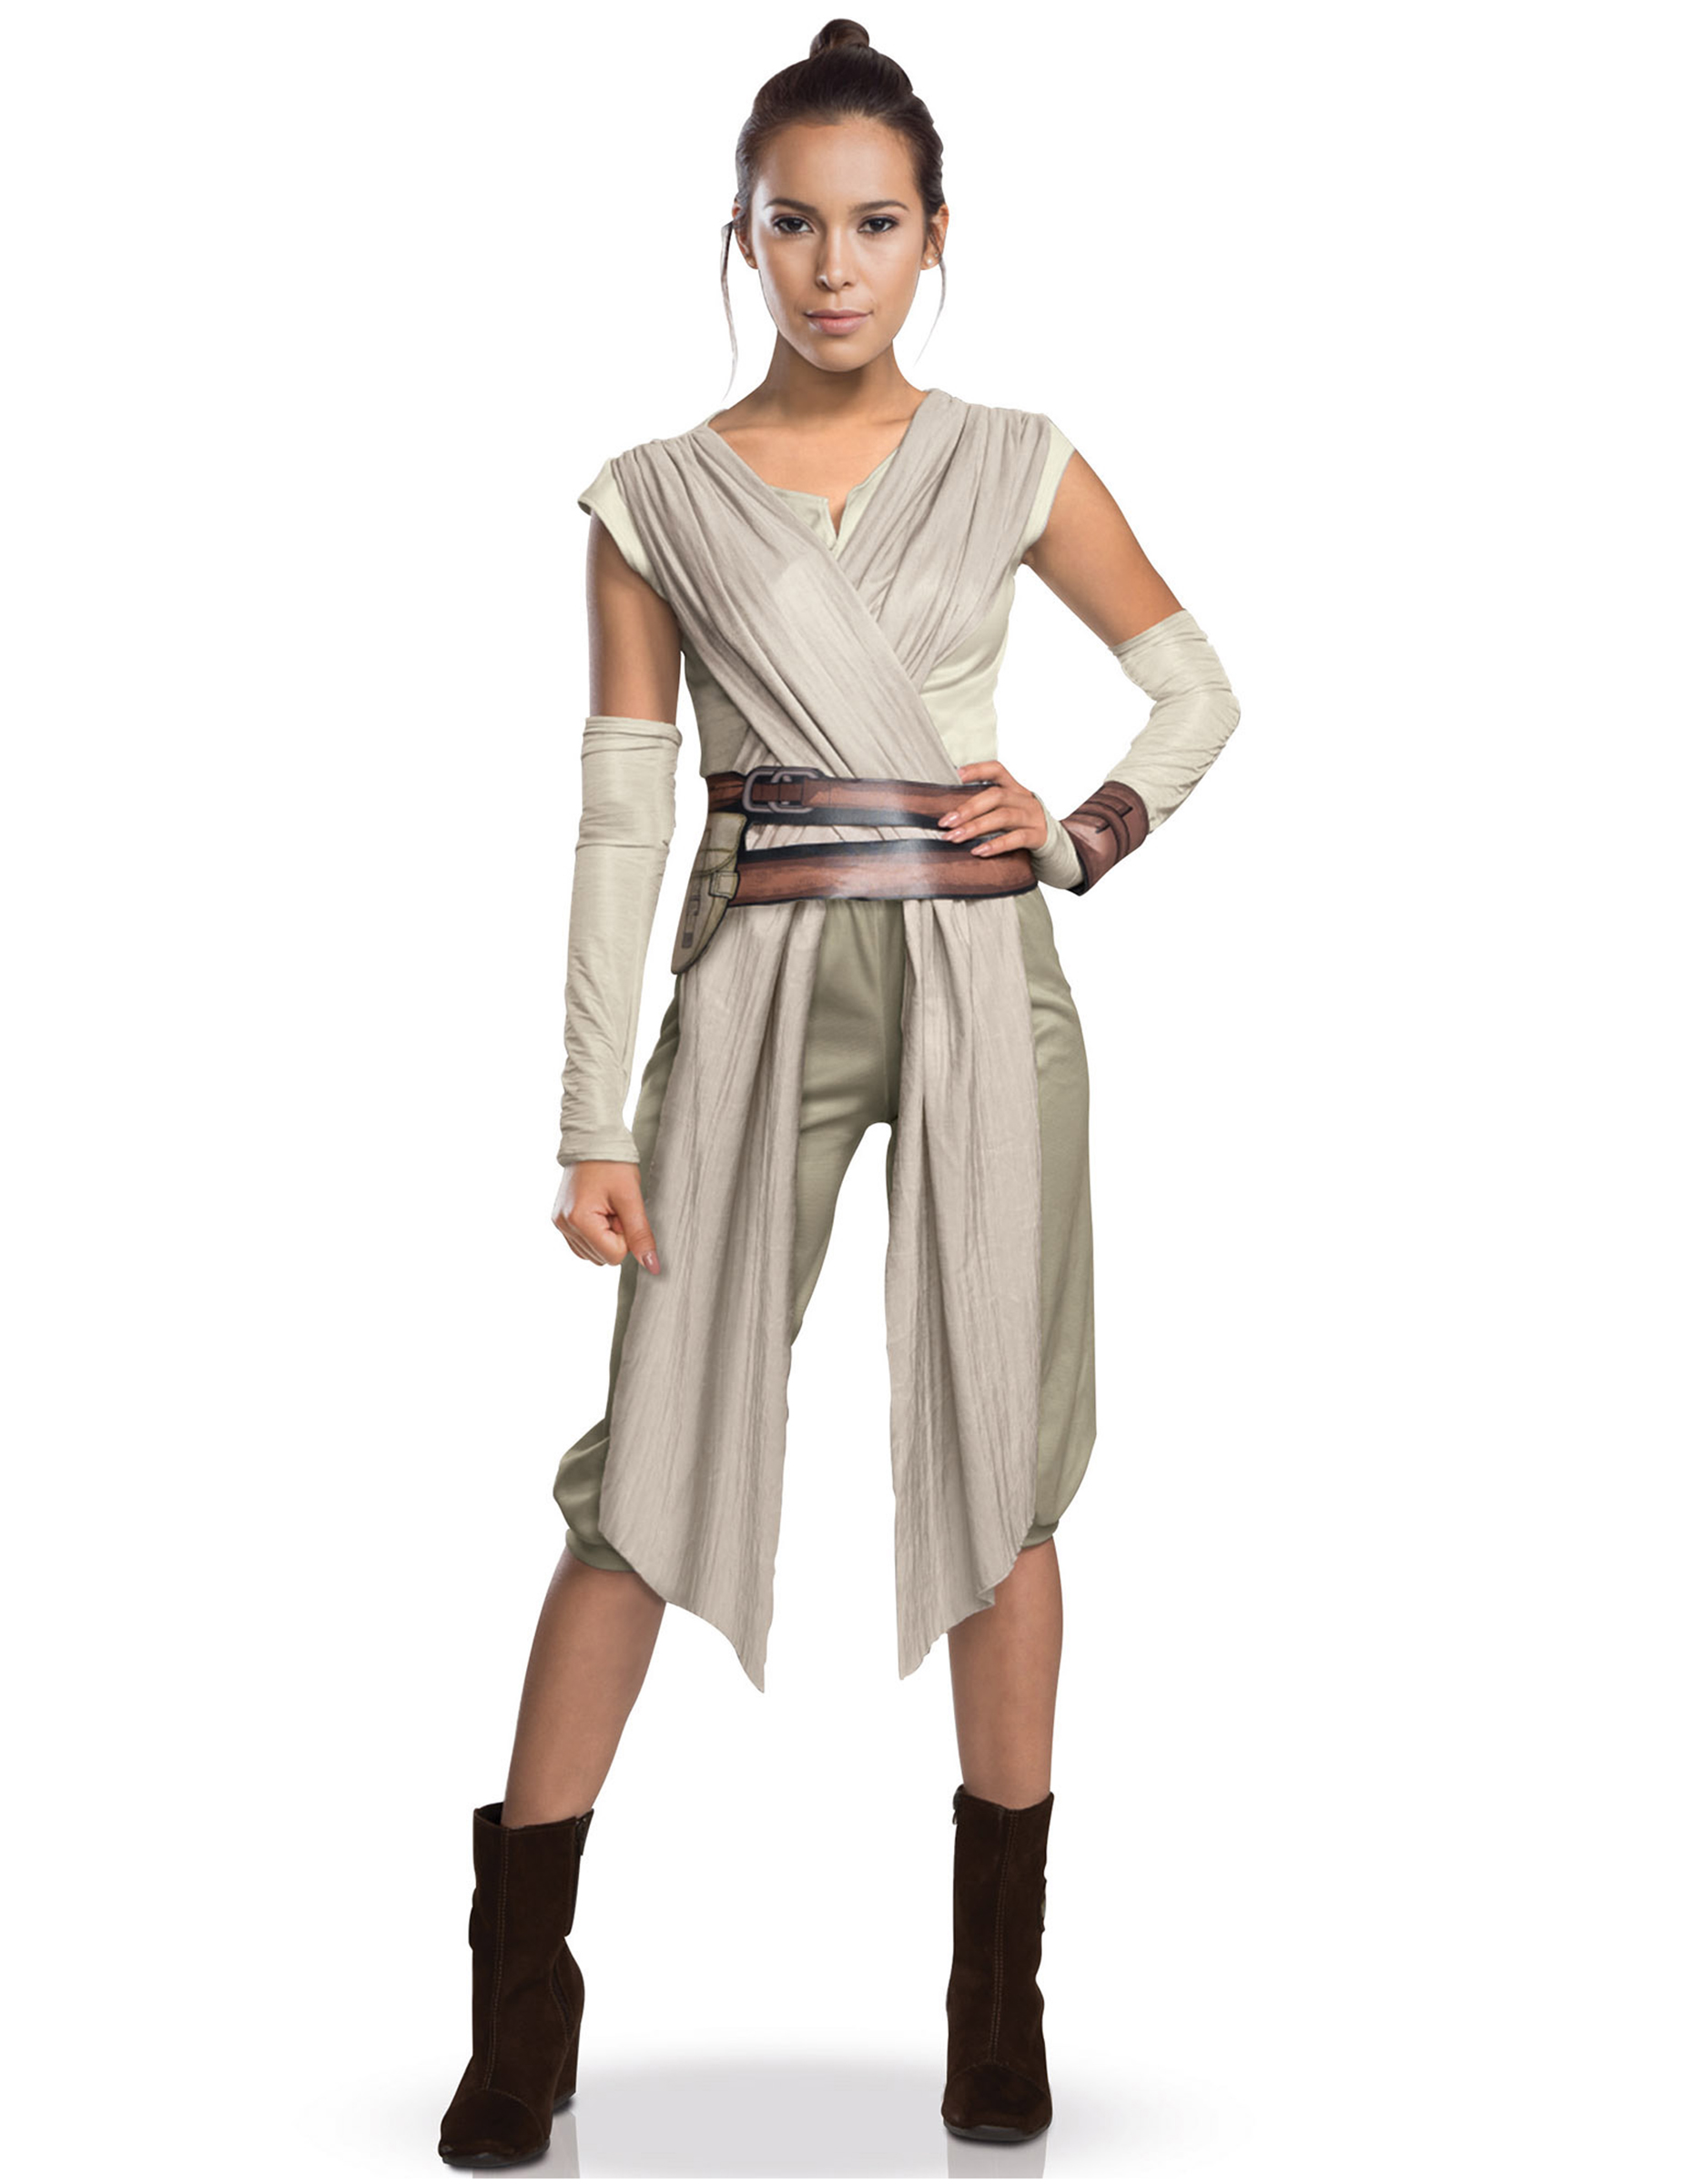 Guisement Adulte Luxe Rey Star Wars Vii Deguise Toi